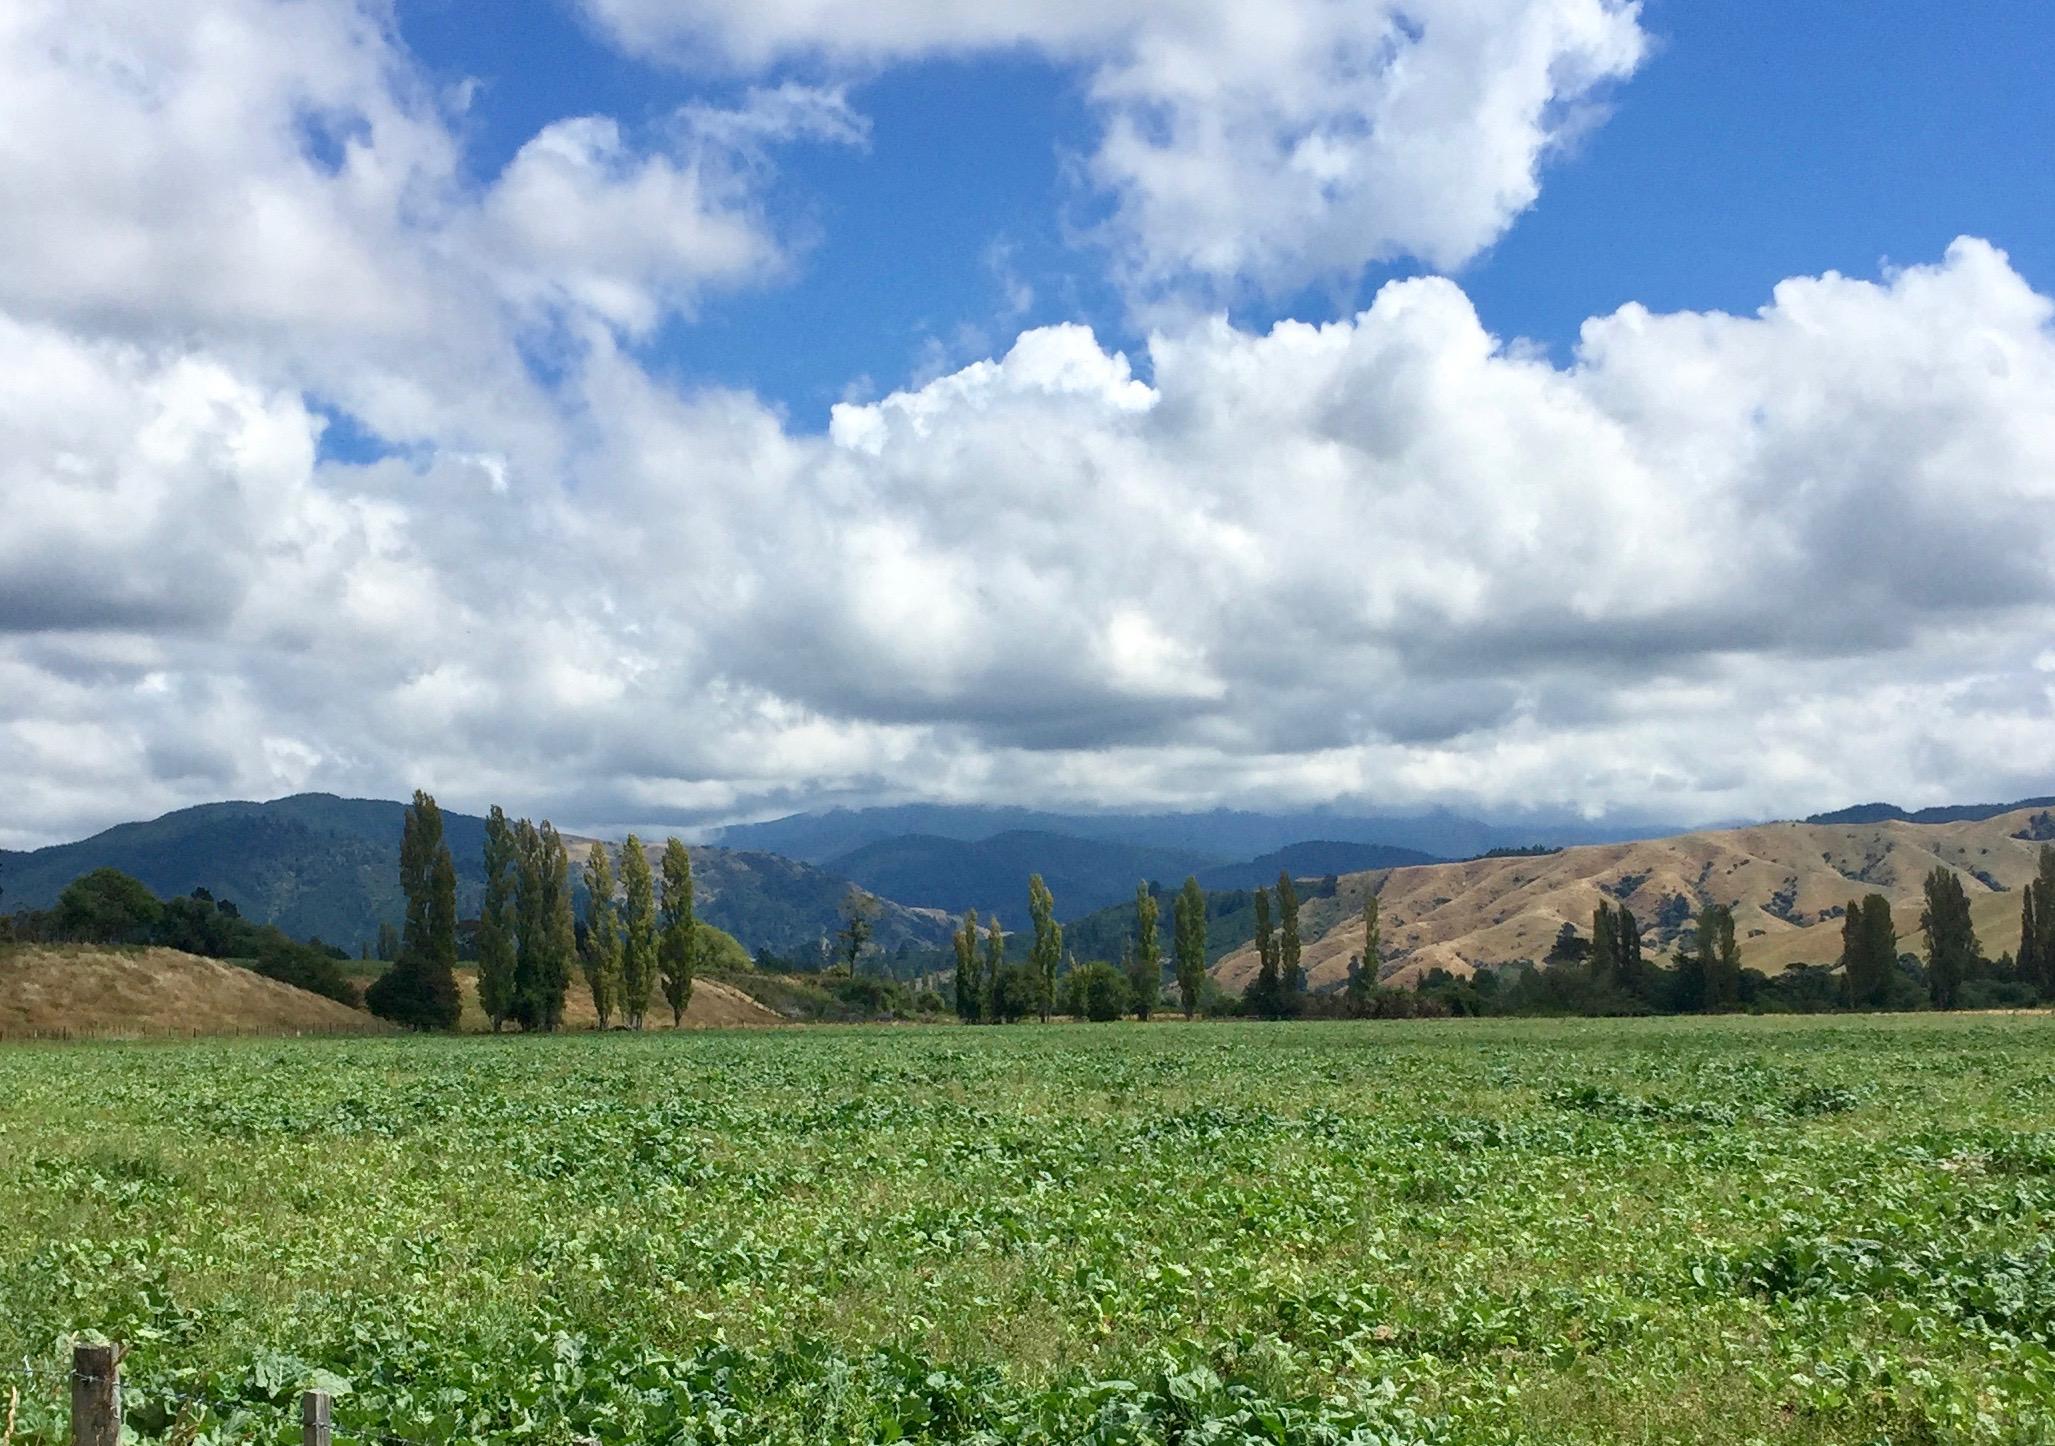 Weedy fields